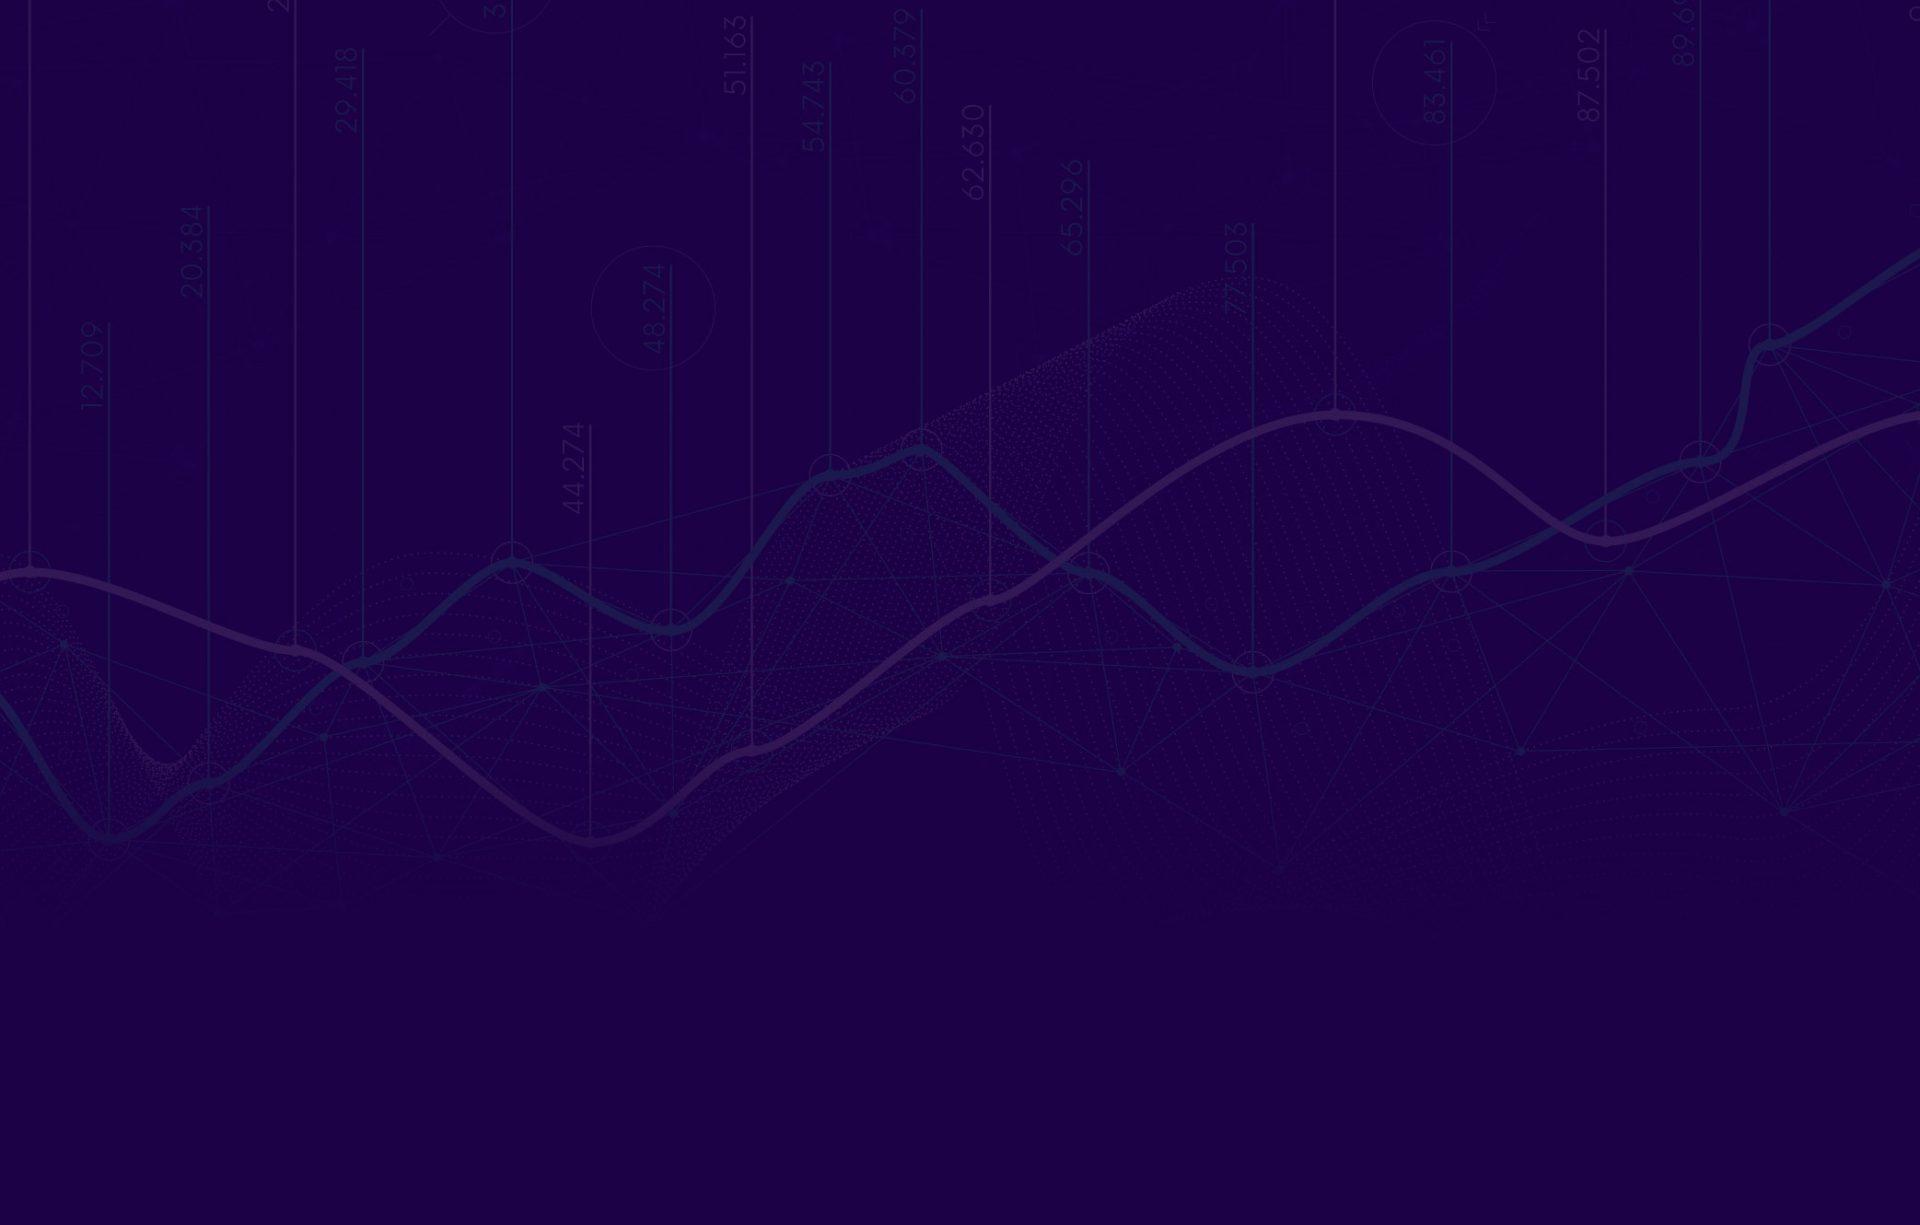 bar graph background